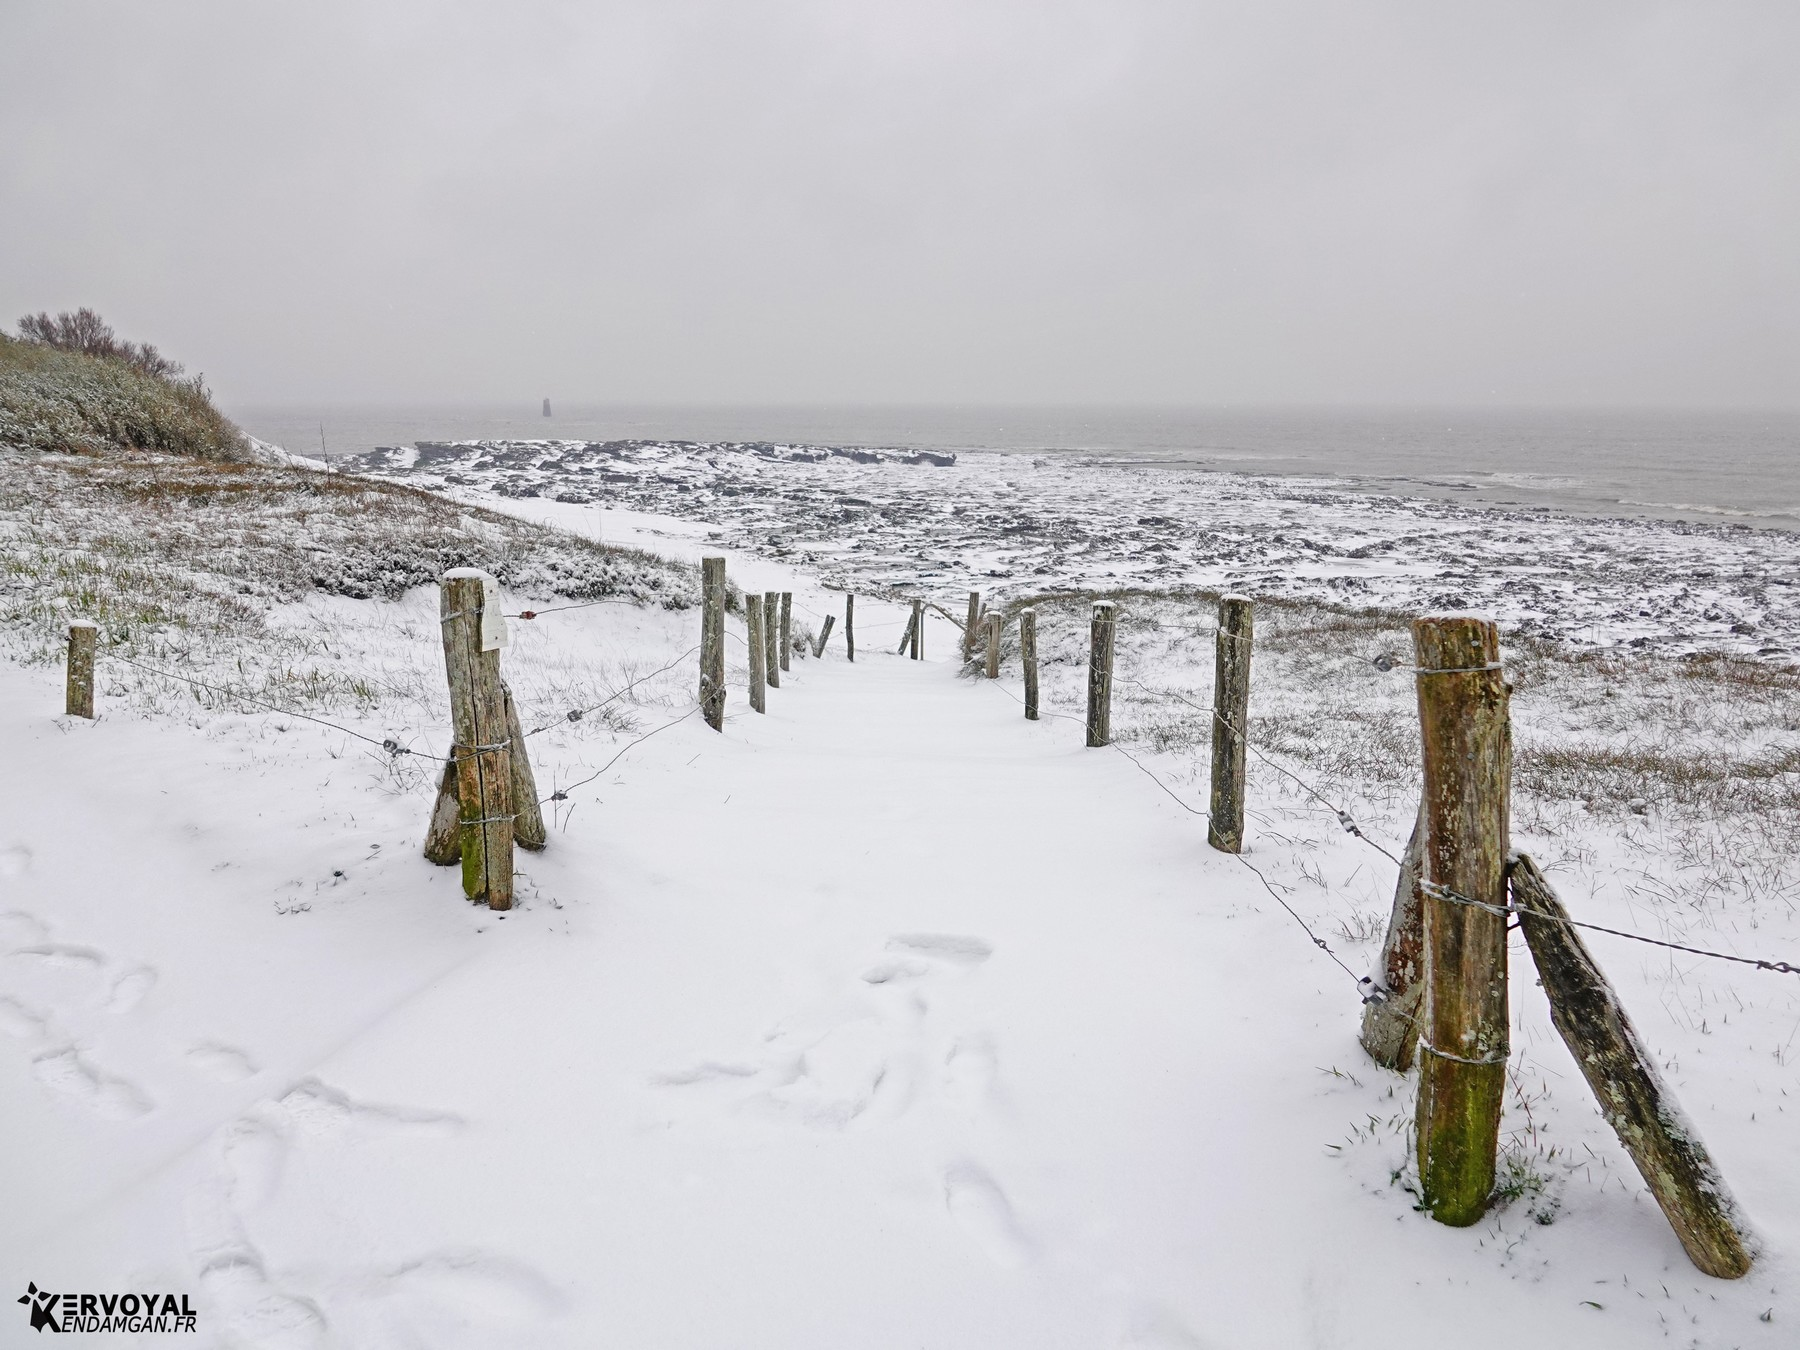 neige à kervoyal 11 février 2021 damgan morbihan (2)